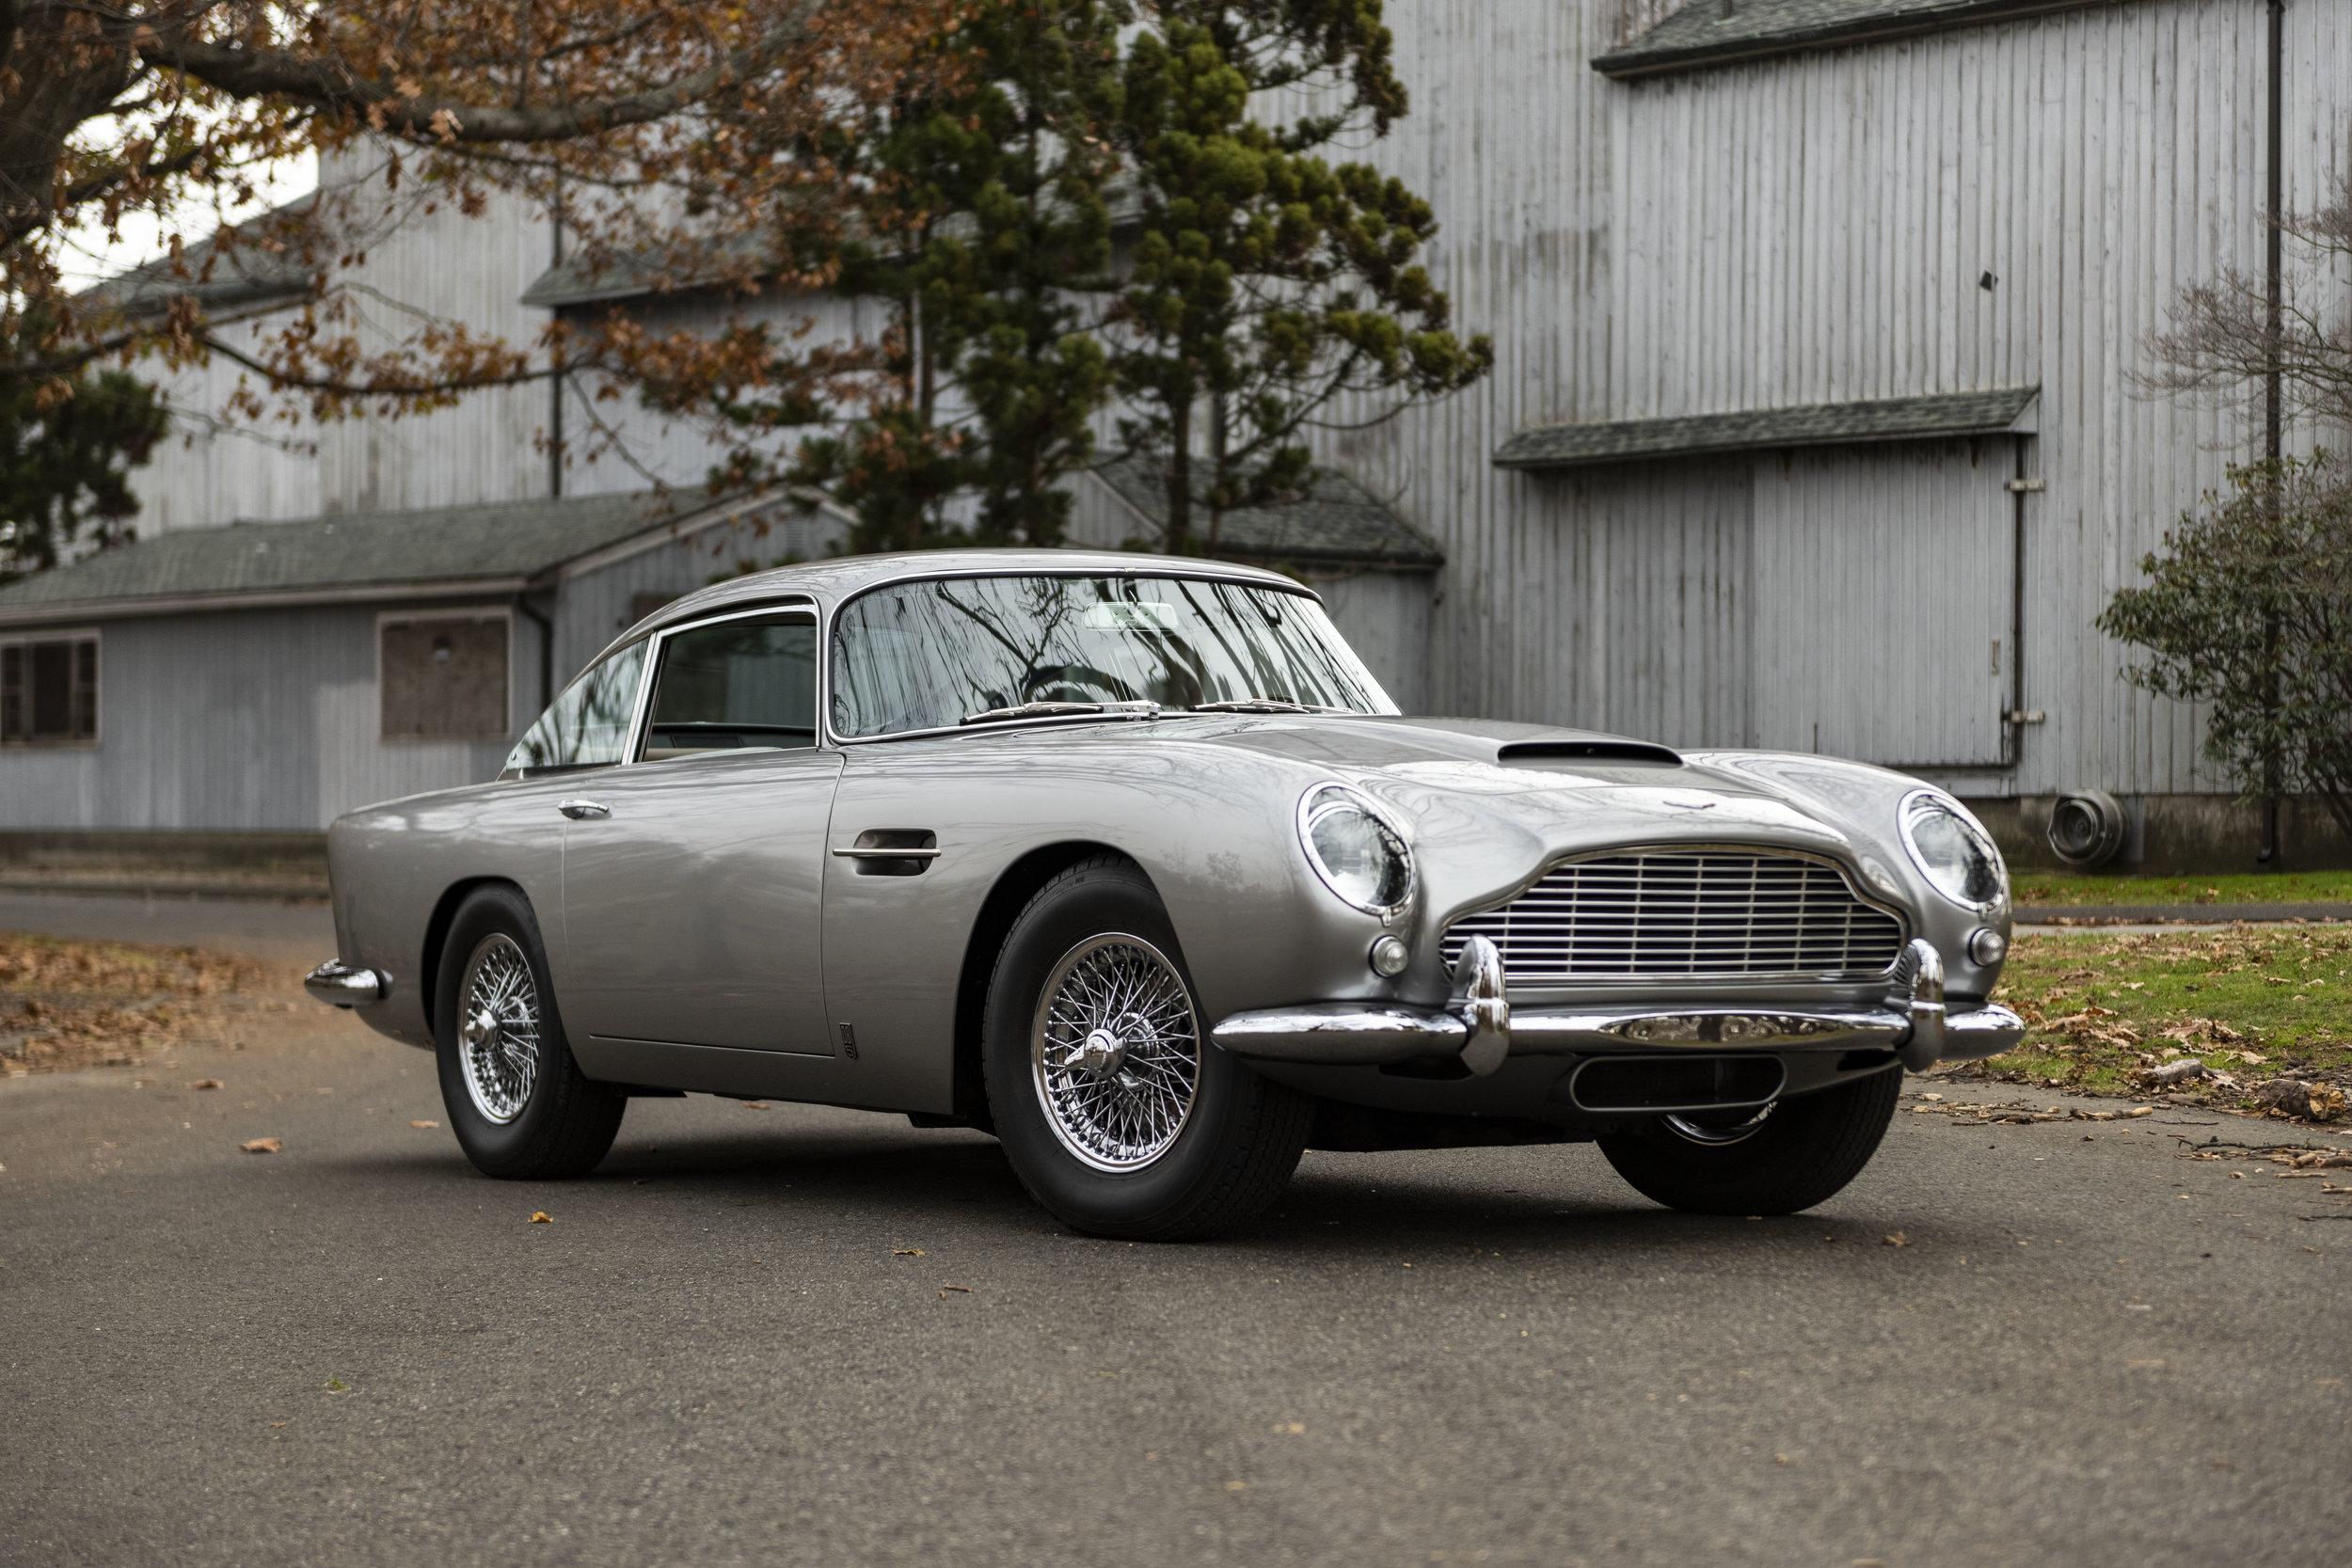 1965 Aston Martin Db5 For Sale Automotive Restorations Inc Automotive Restorations Inc